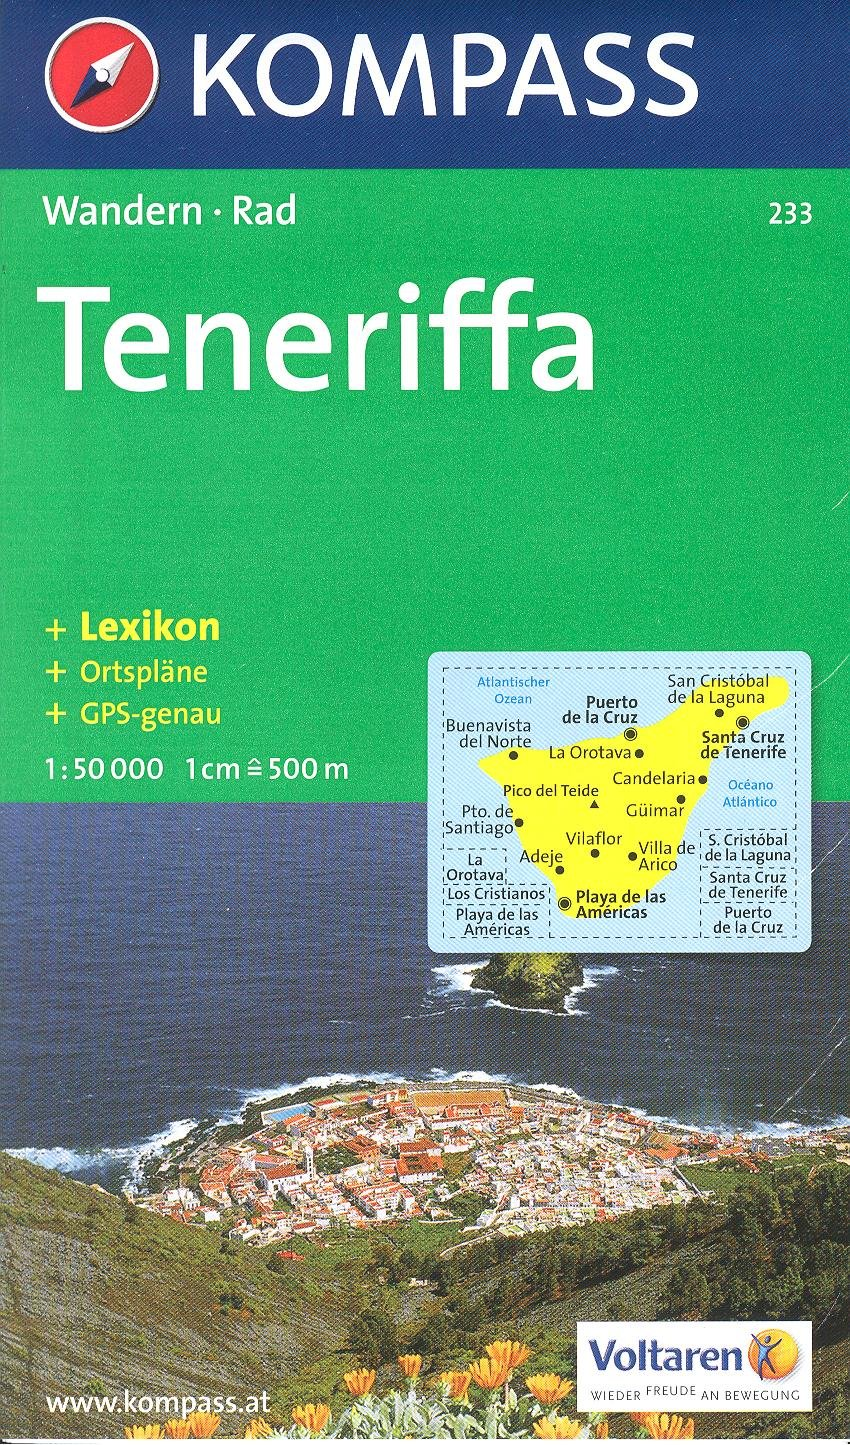 Tenerife 1:50.000 mapa senderismo KOMPASS # 233: Amazon.es: KompassMaps: Libros